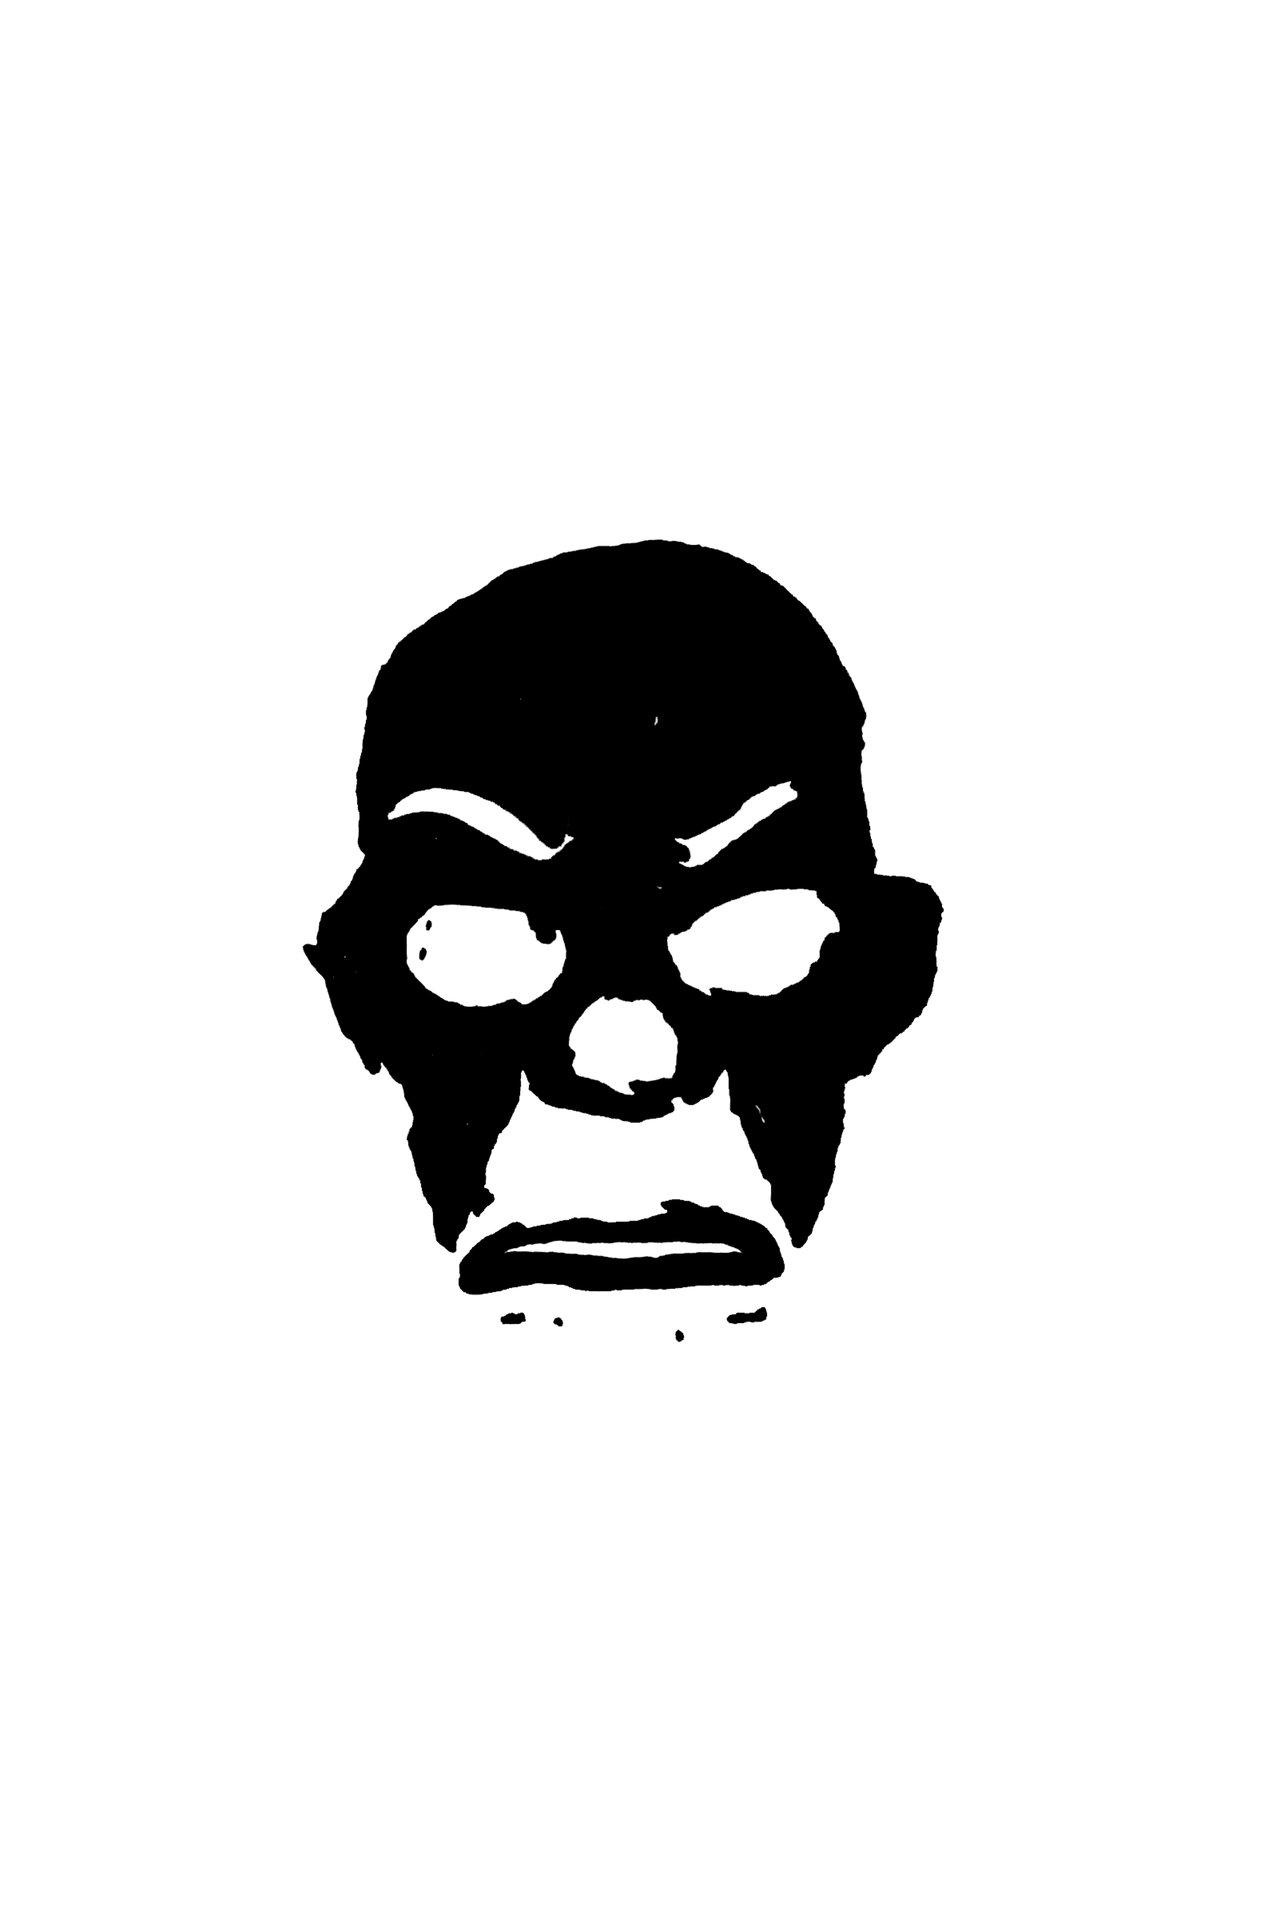 Drawn masks robber Mask bookabooka bookabooka Mask Bank